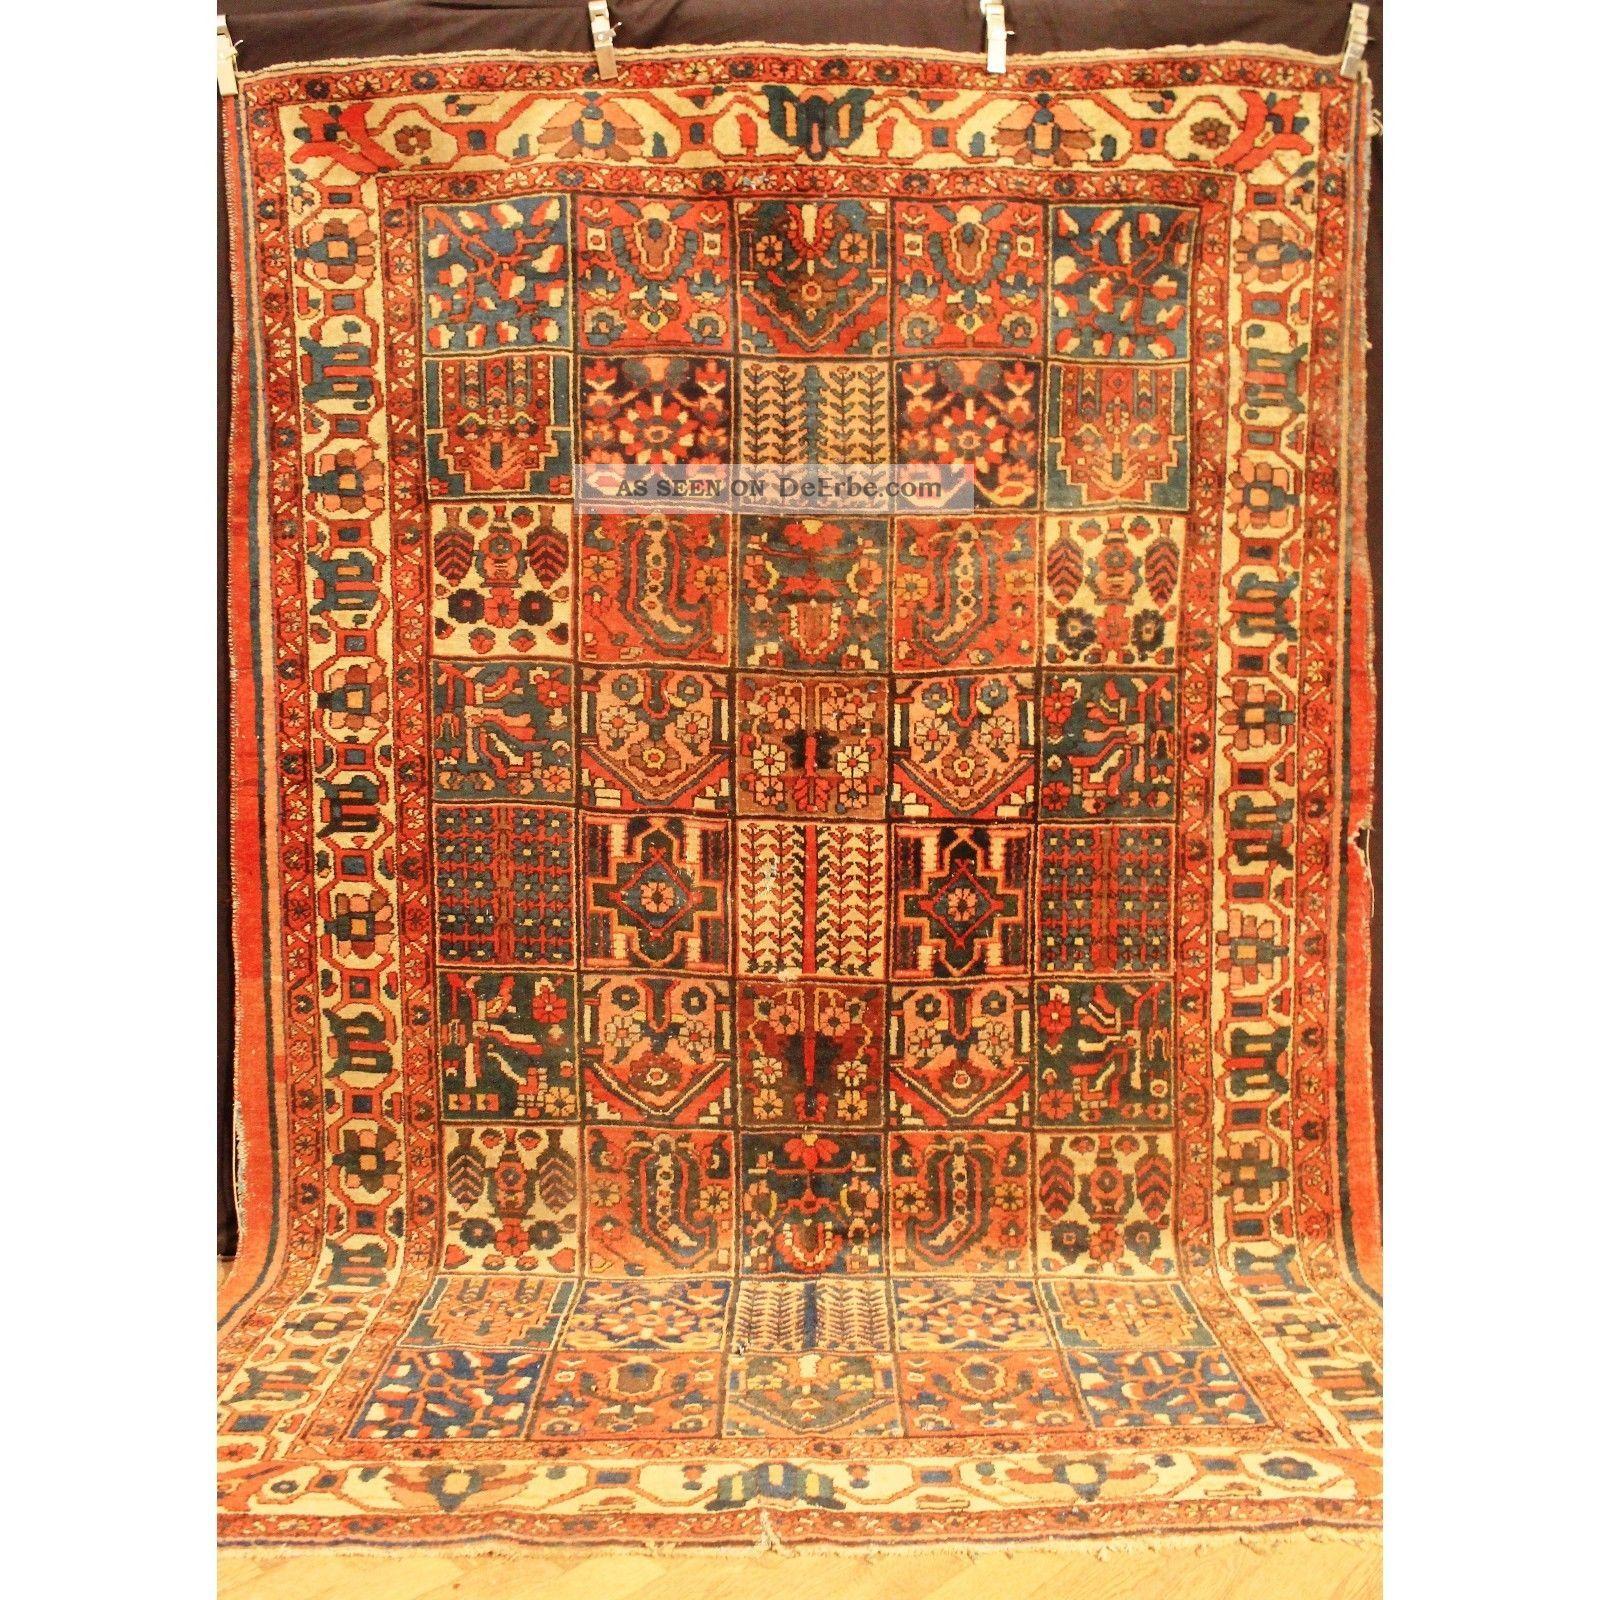 antik handgekn pft orientteppich felder bachtia vintage old rug carpet 295x205cm. Black Bedroom Furniture Sets. Home Design Ideas